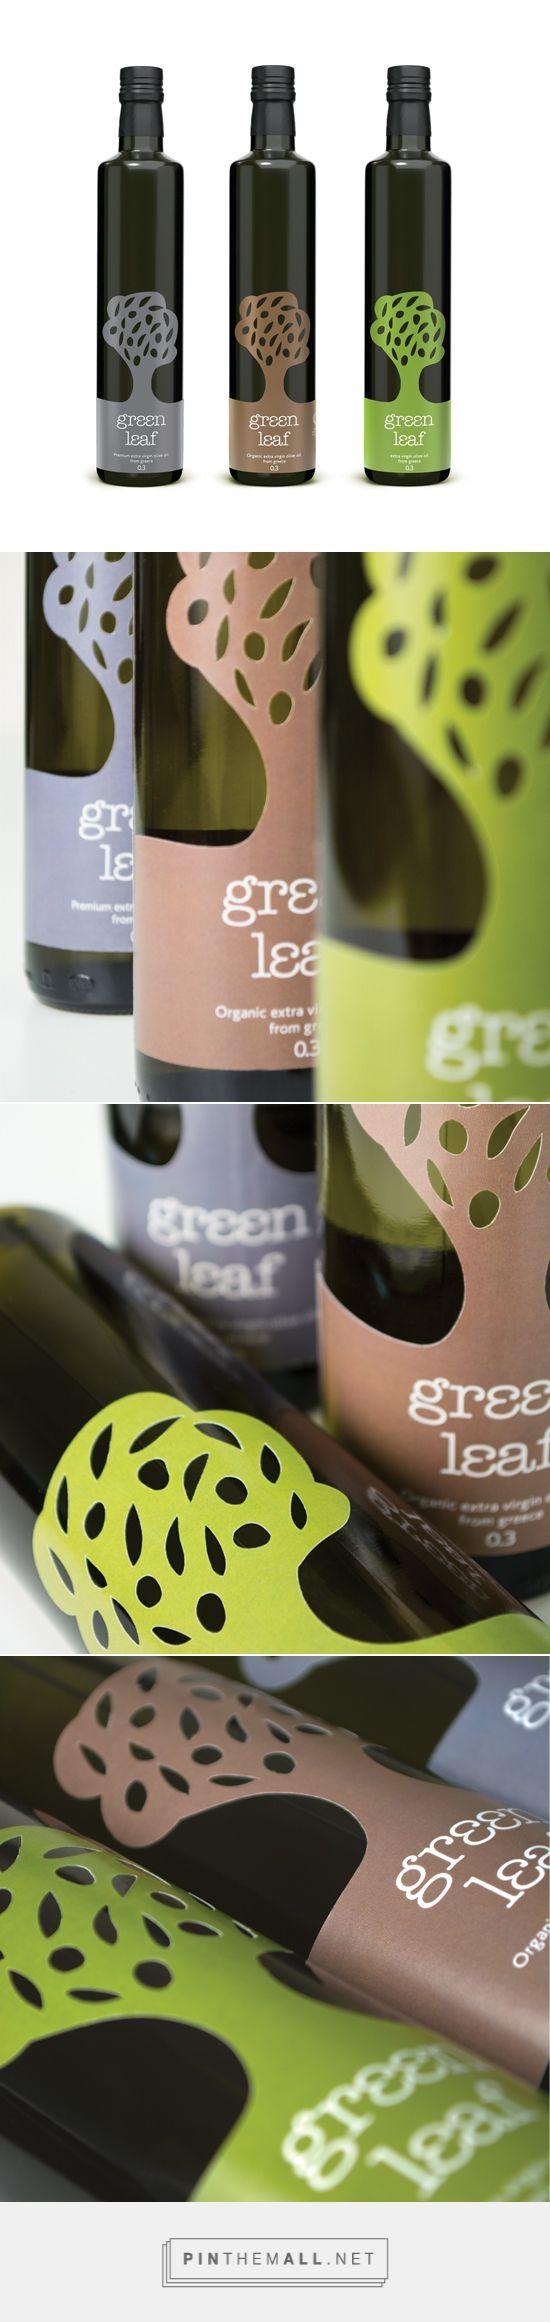 Green Leaf olive oil | 2yolk